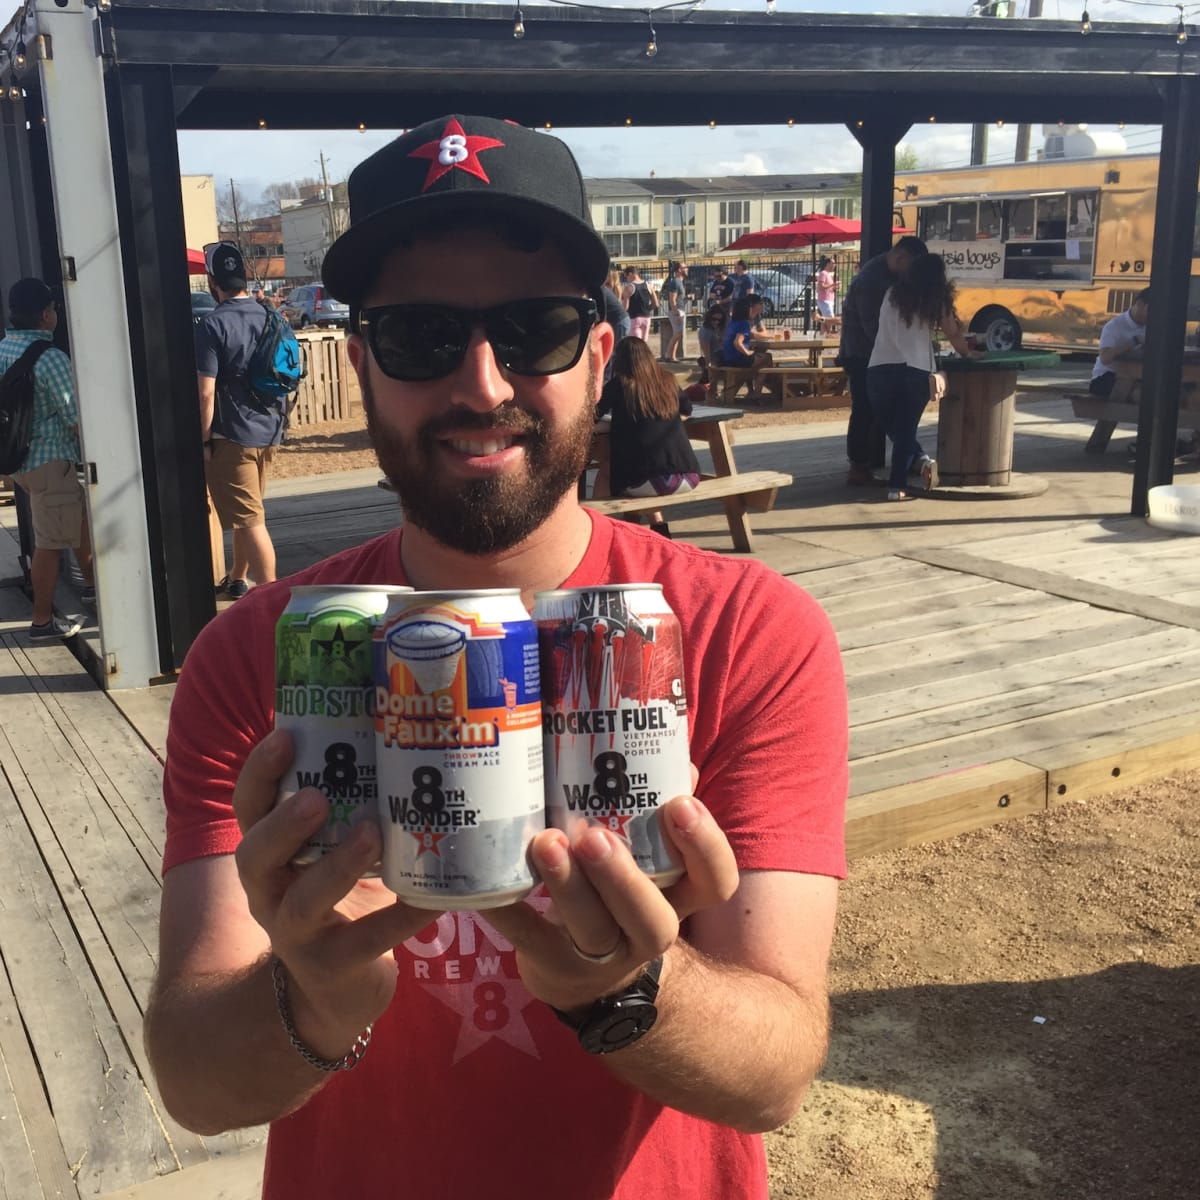 8th Wonder Brewery cans Ryan Soroka